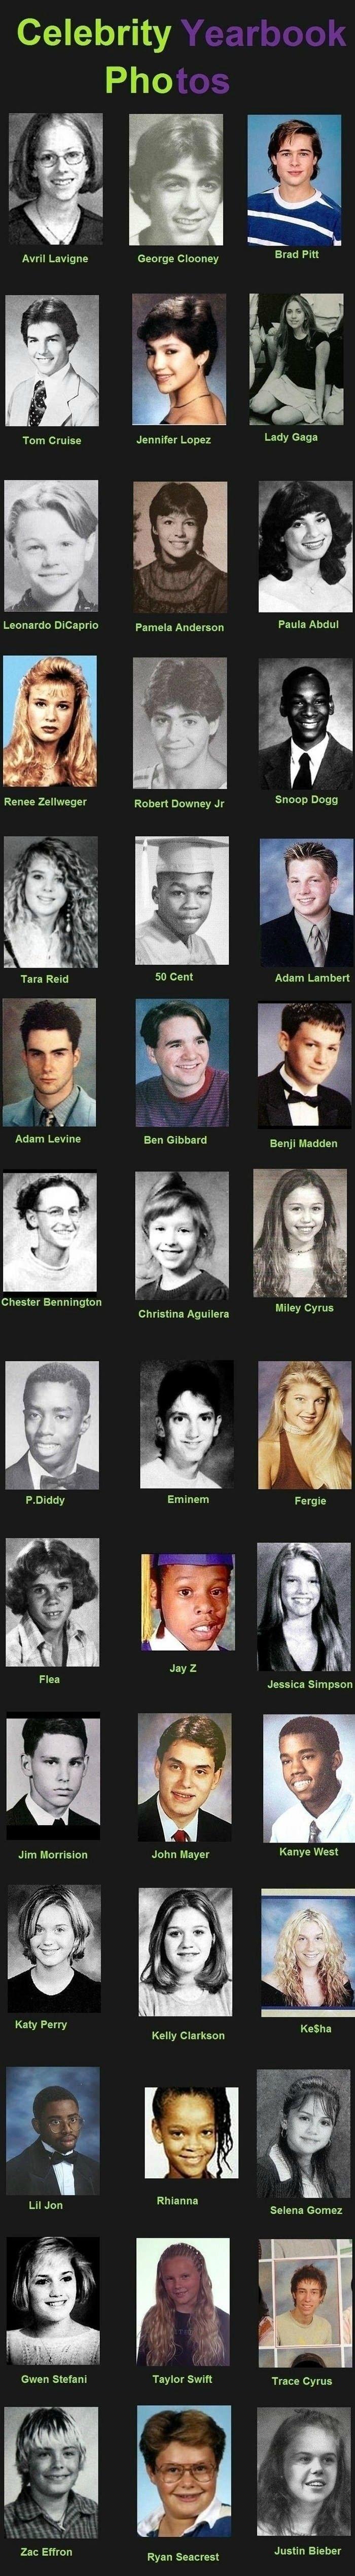 Celebrity Yearbook Photos - How they looked in high school. #Stars #Celebreties